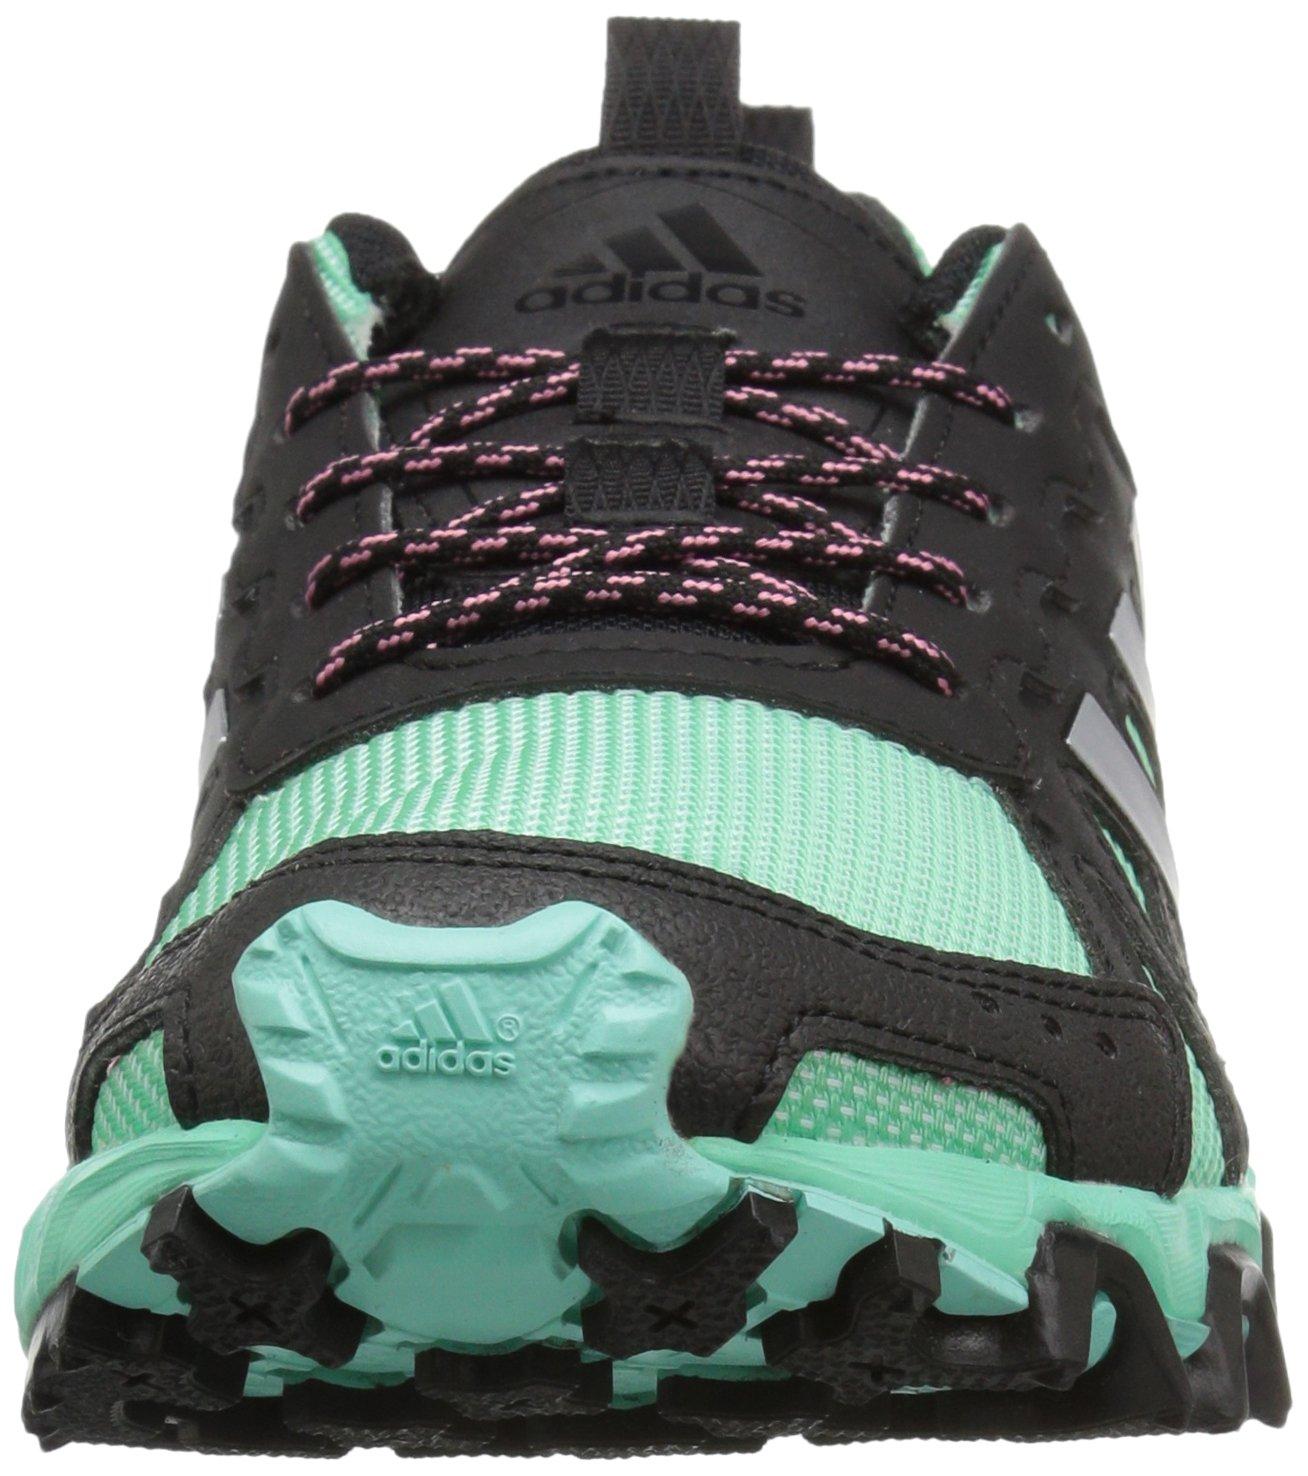 pretty nice 42e1d d23d1 ... adidas Performance Womens Incision 5 W Trail Runner B01H7Z5OGA 5  Incision B(M) US ...